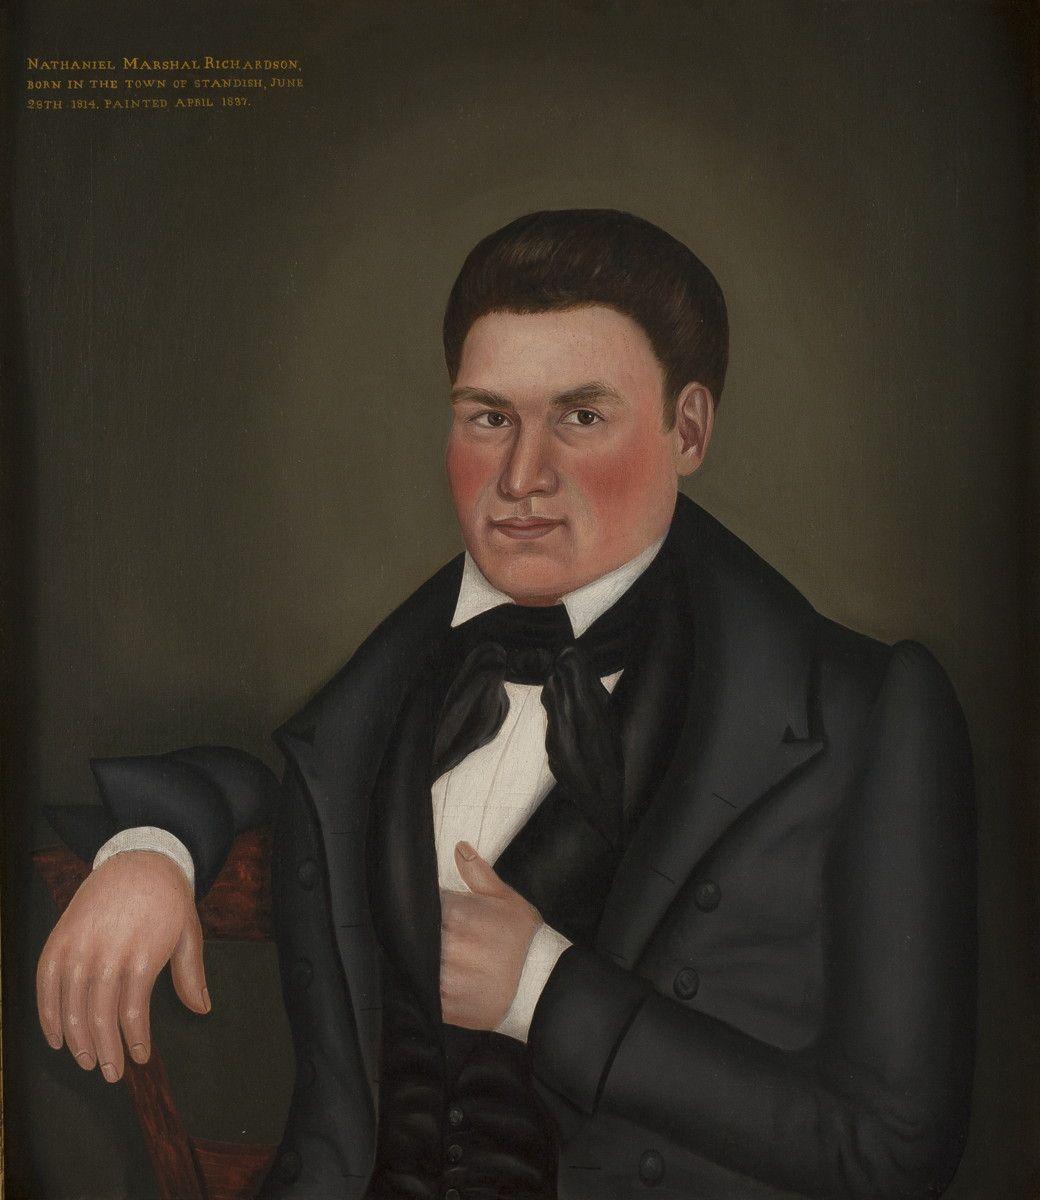 Nathaniel Marshall